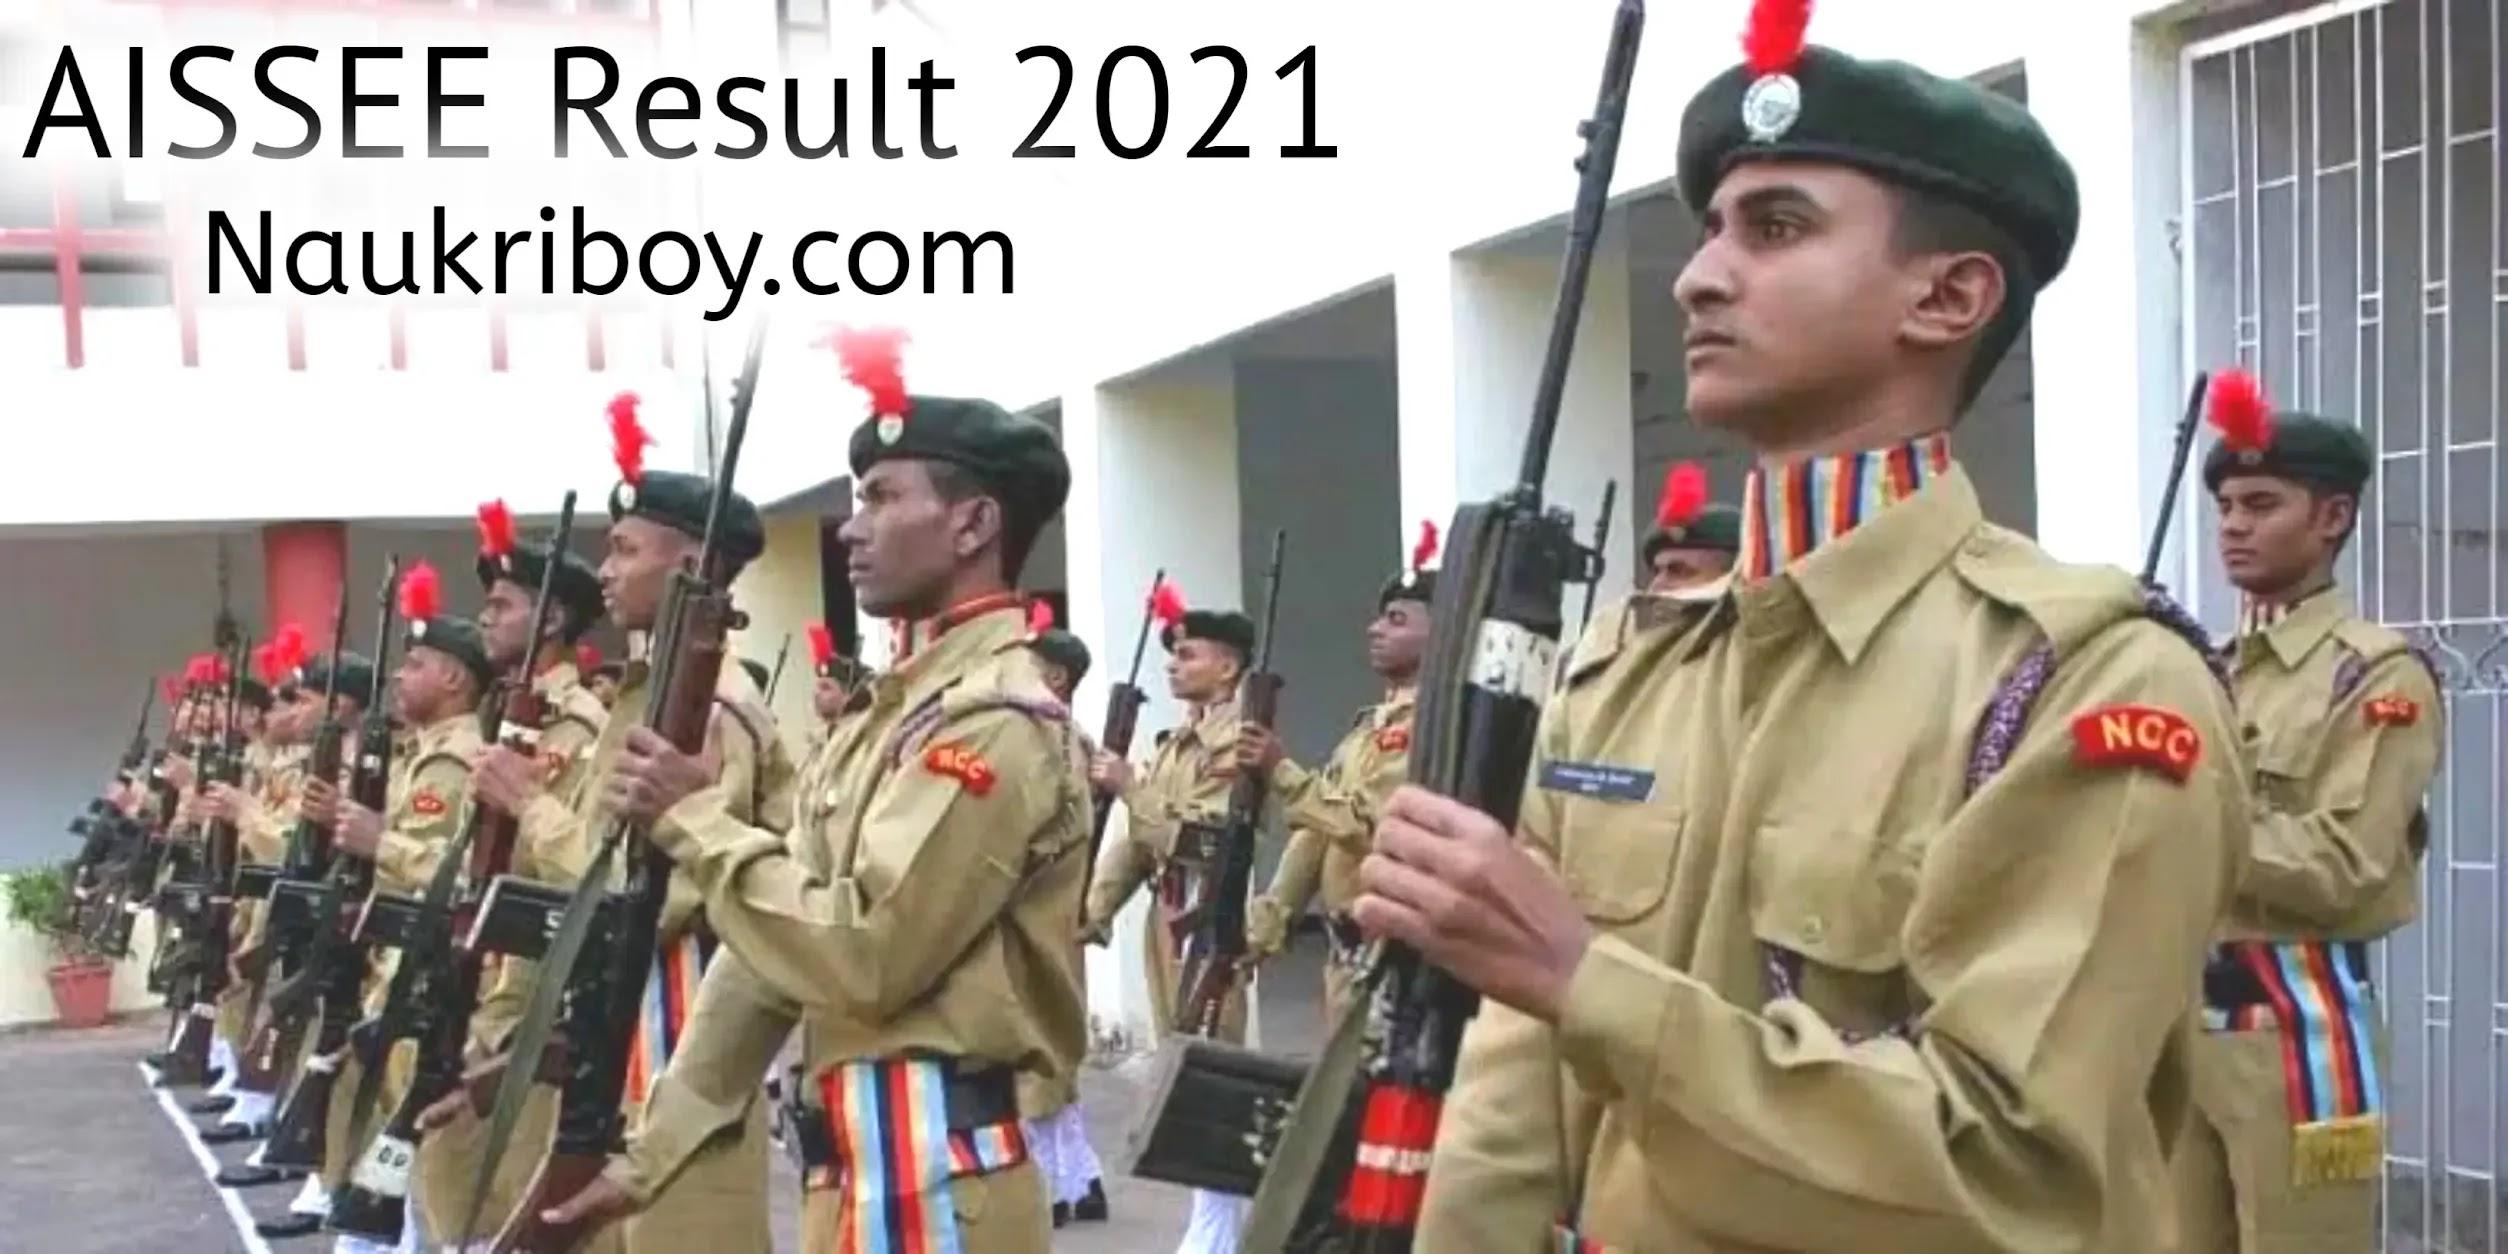 CG Sainik School Result 2021 । छत्तीसगढ़ सैनिक स्कूल रिजल्ट 2021...Naukriboy.com सैनिक स्कूल रिजल्ट 2021  अम्बिकापुर सैनिक स्कूल रिजल्ट ambikapur sainik school result naukriboy.com